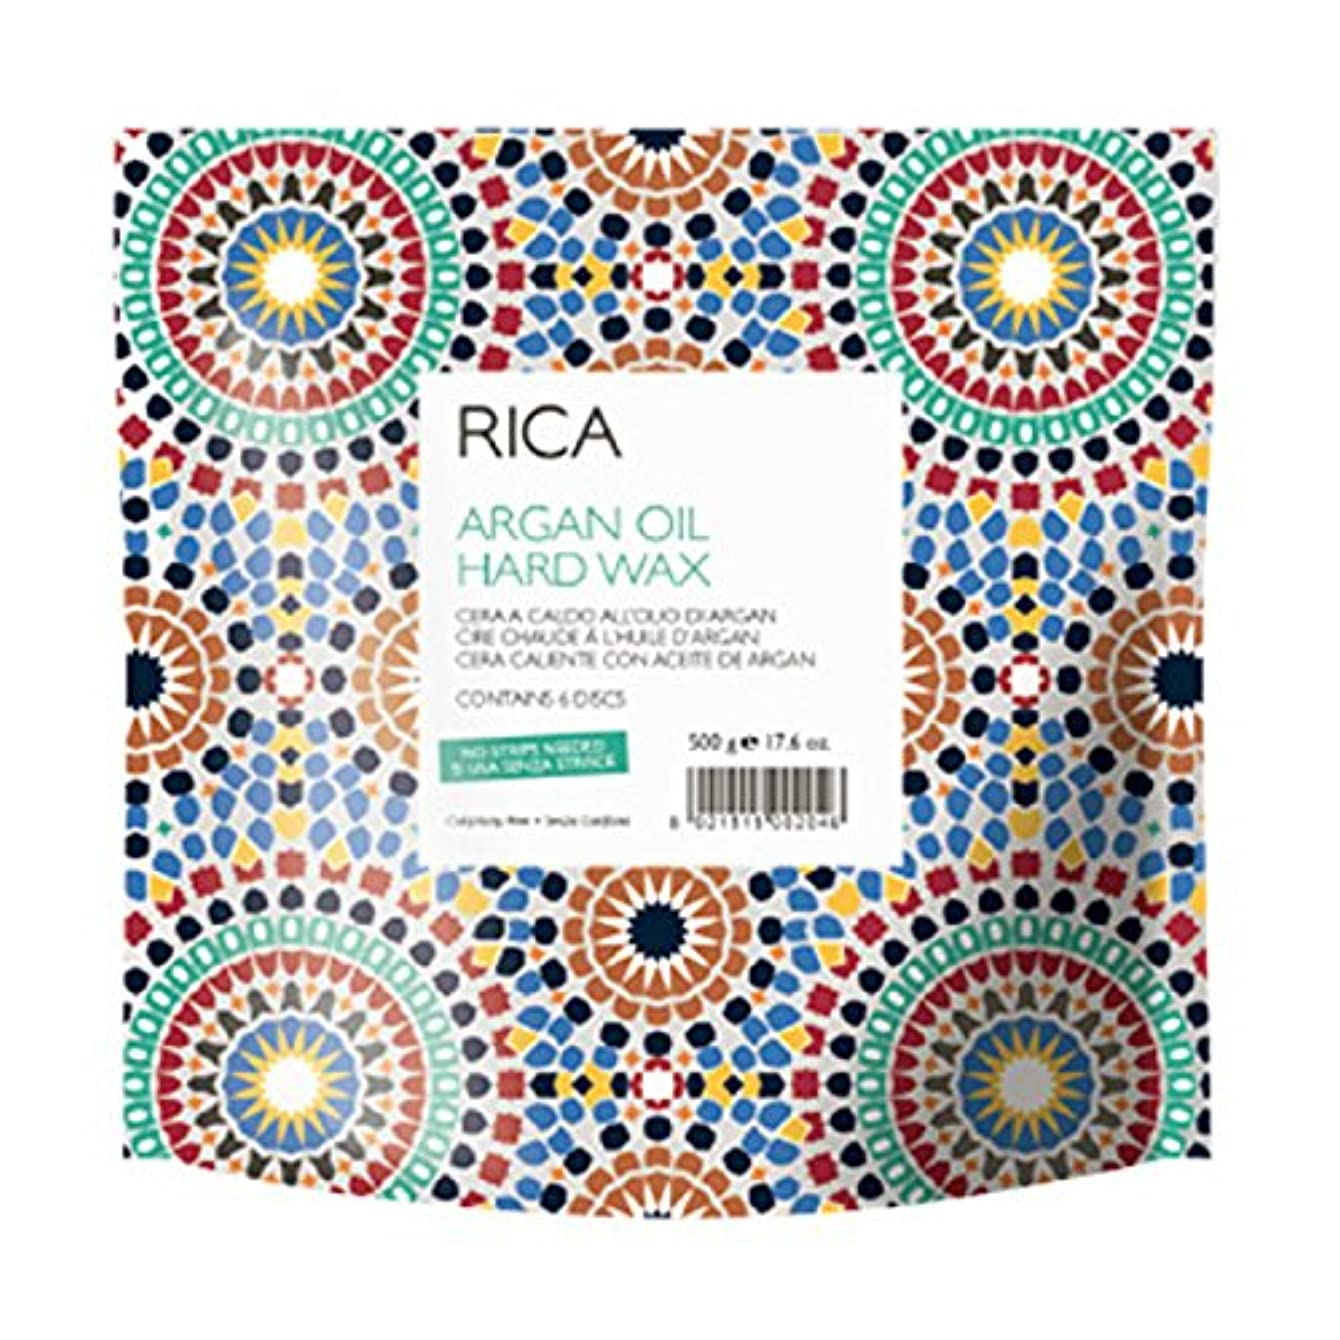 RICA ハードワックス(アルガンオイル)500g